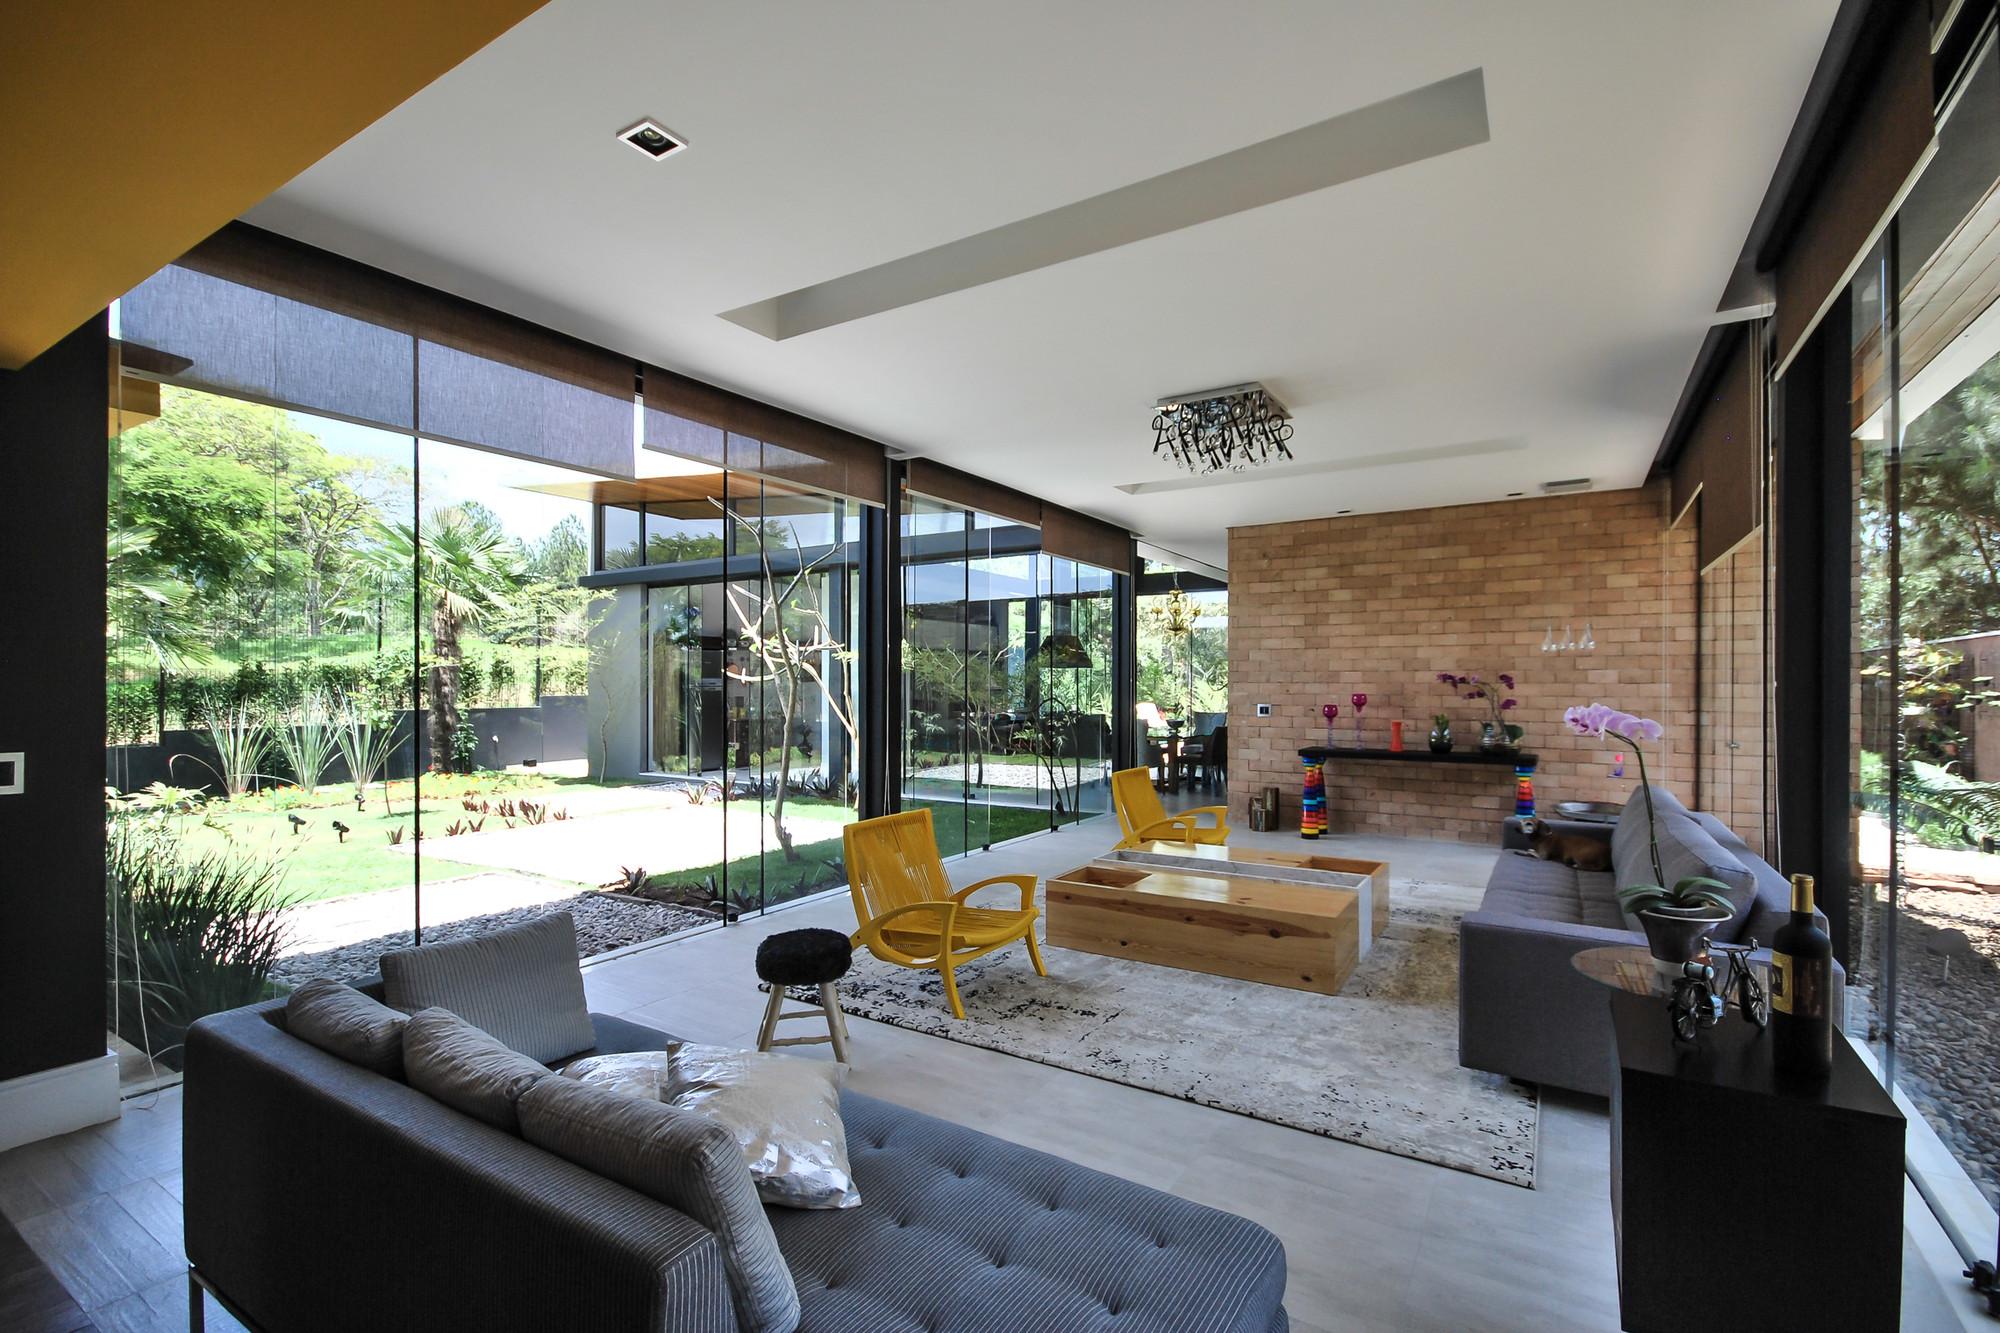 Galeria De Casa Me Otta Albernaz Arquitetura 16